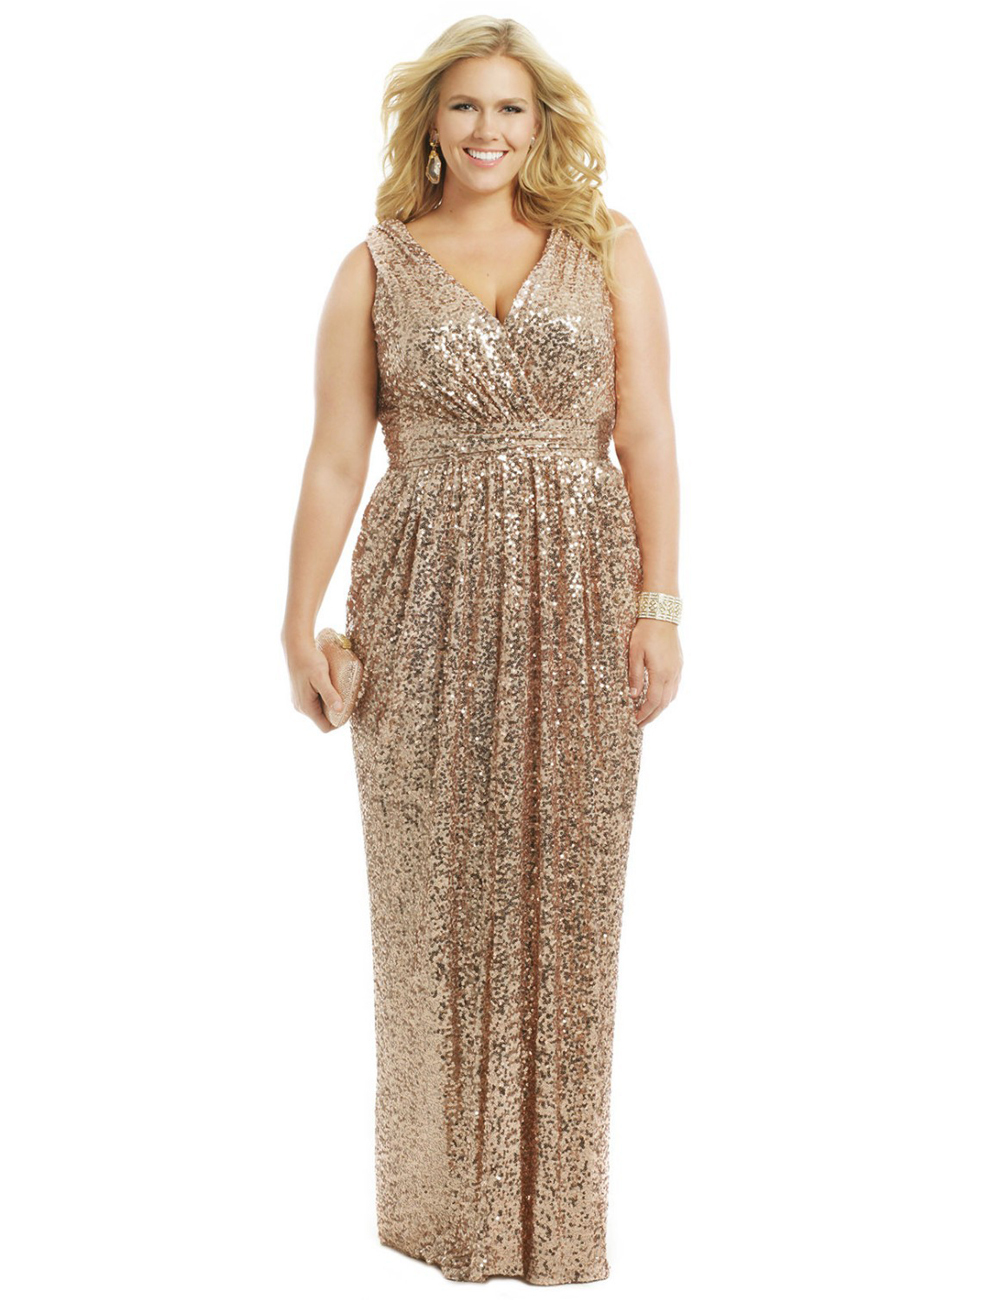 Sequin Gold Dress Photo Album - Vicing